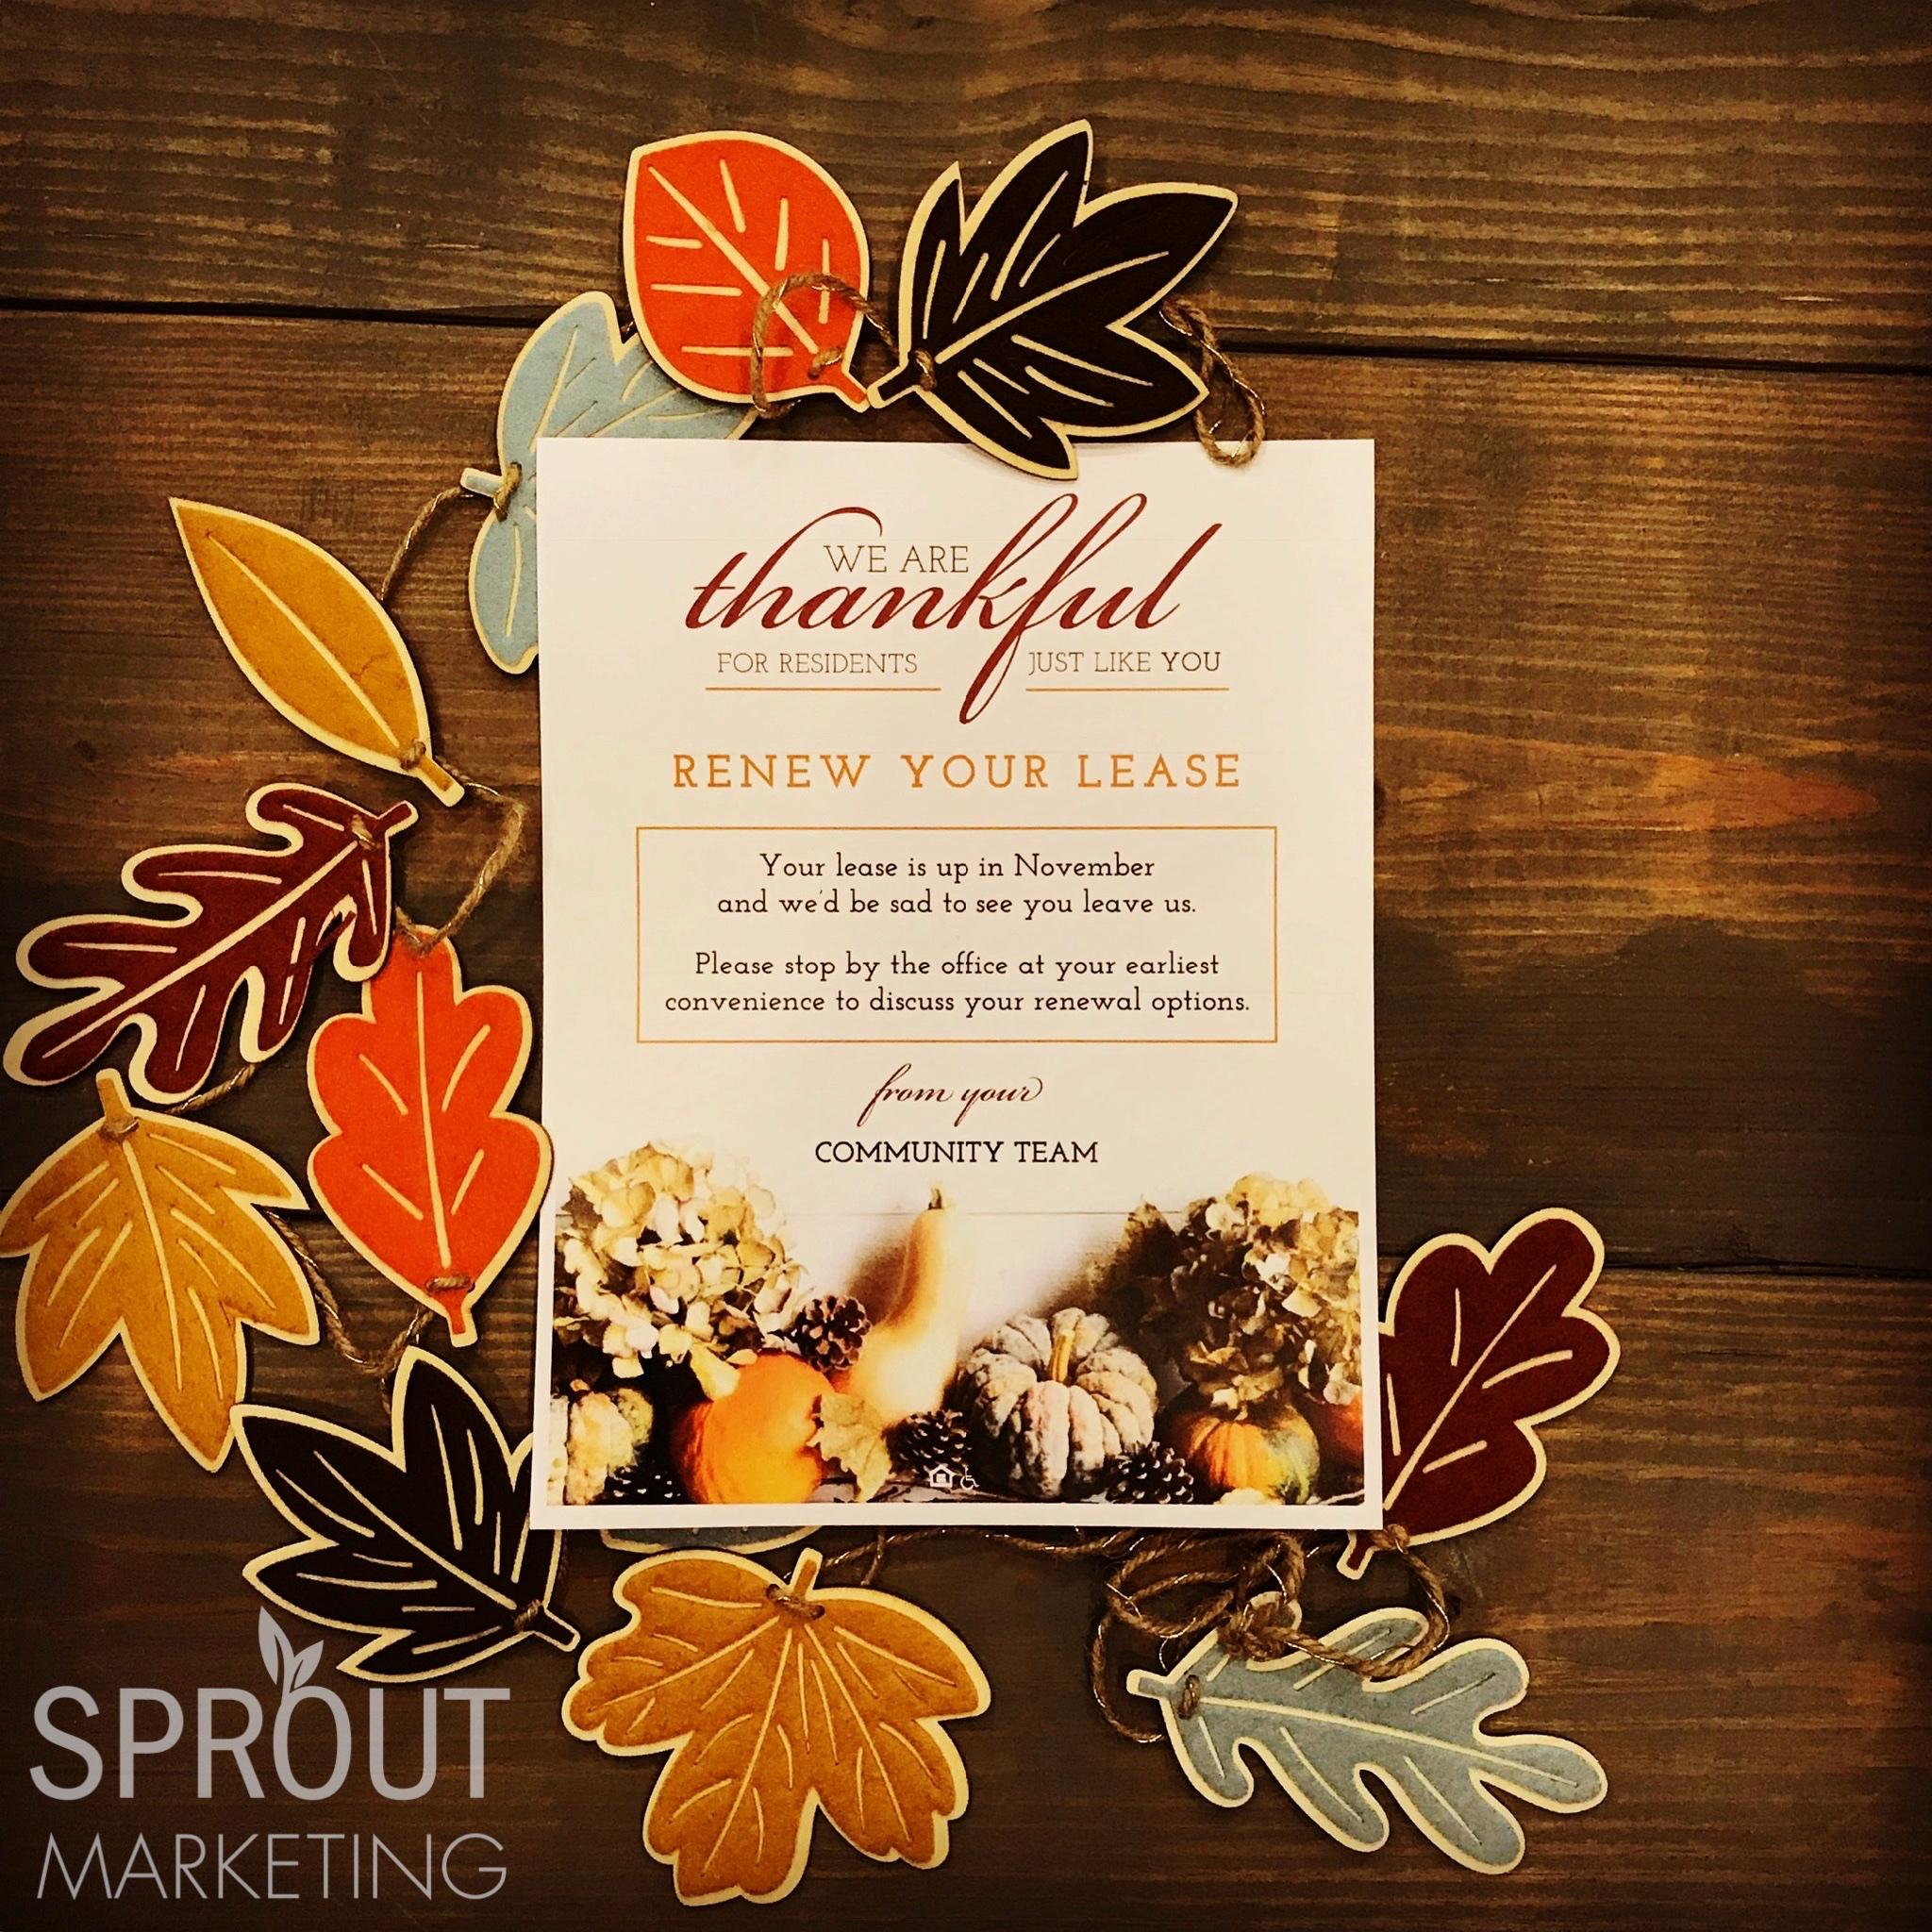 Apartment Renewal Letter - Thankful